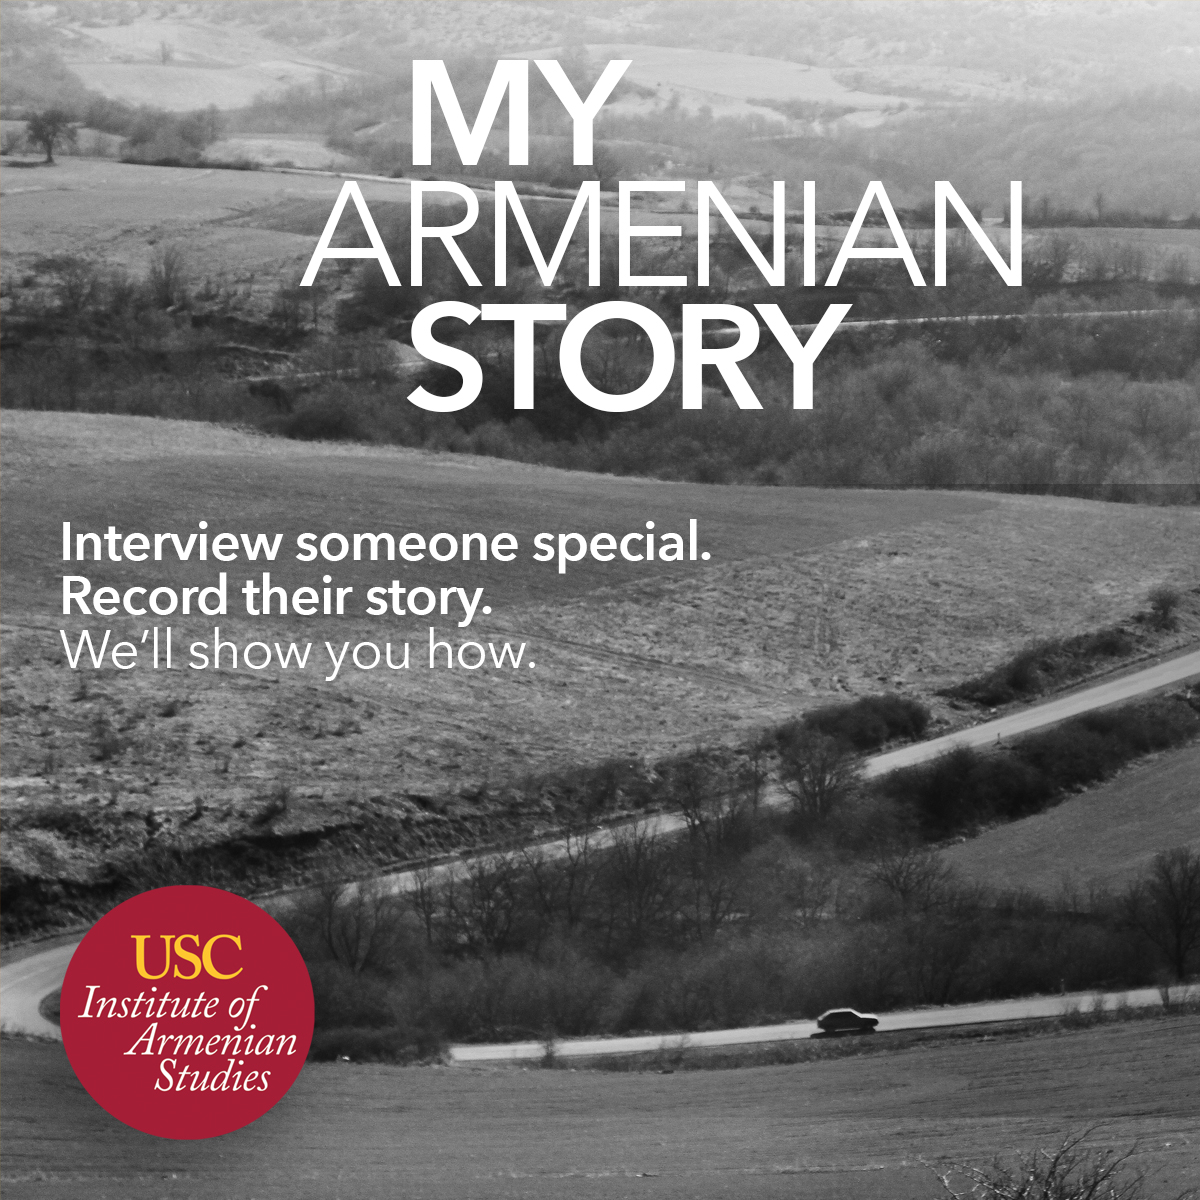 #MyArmenianStory